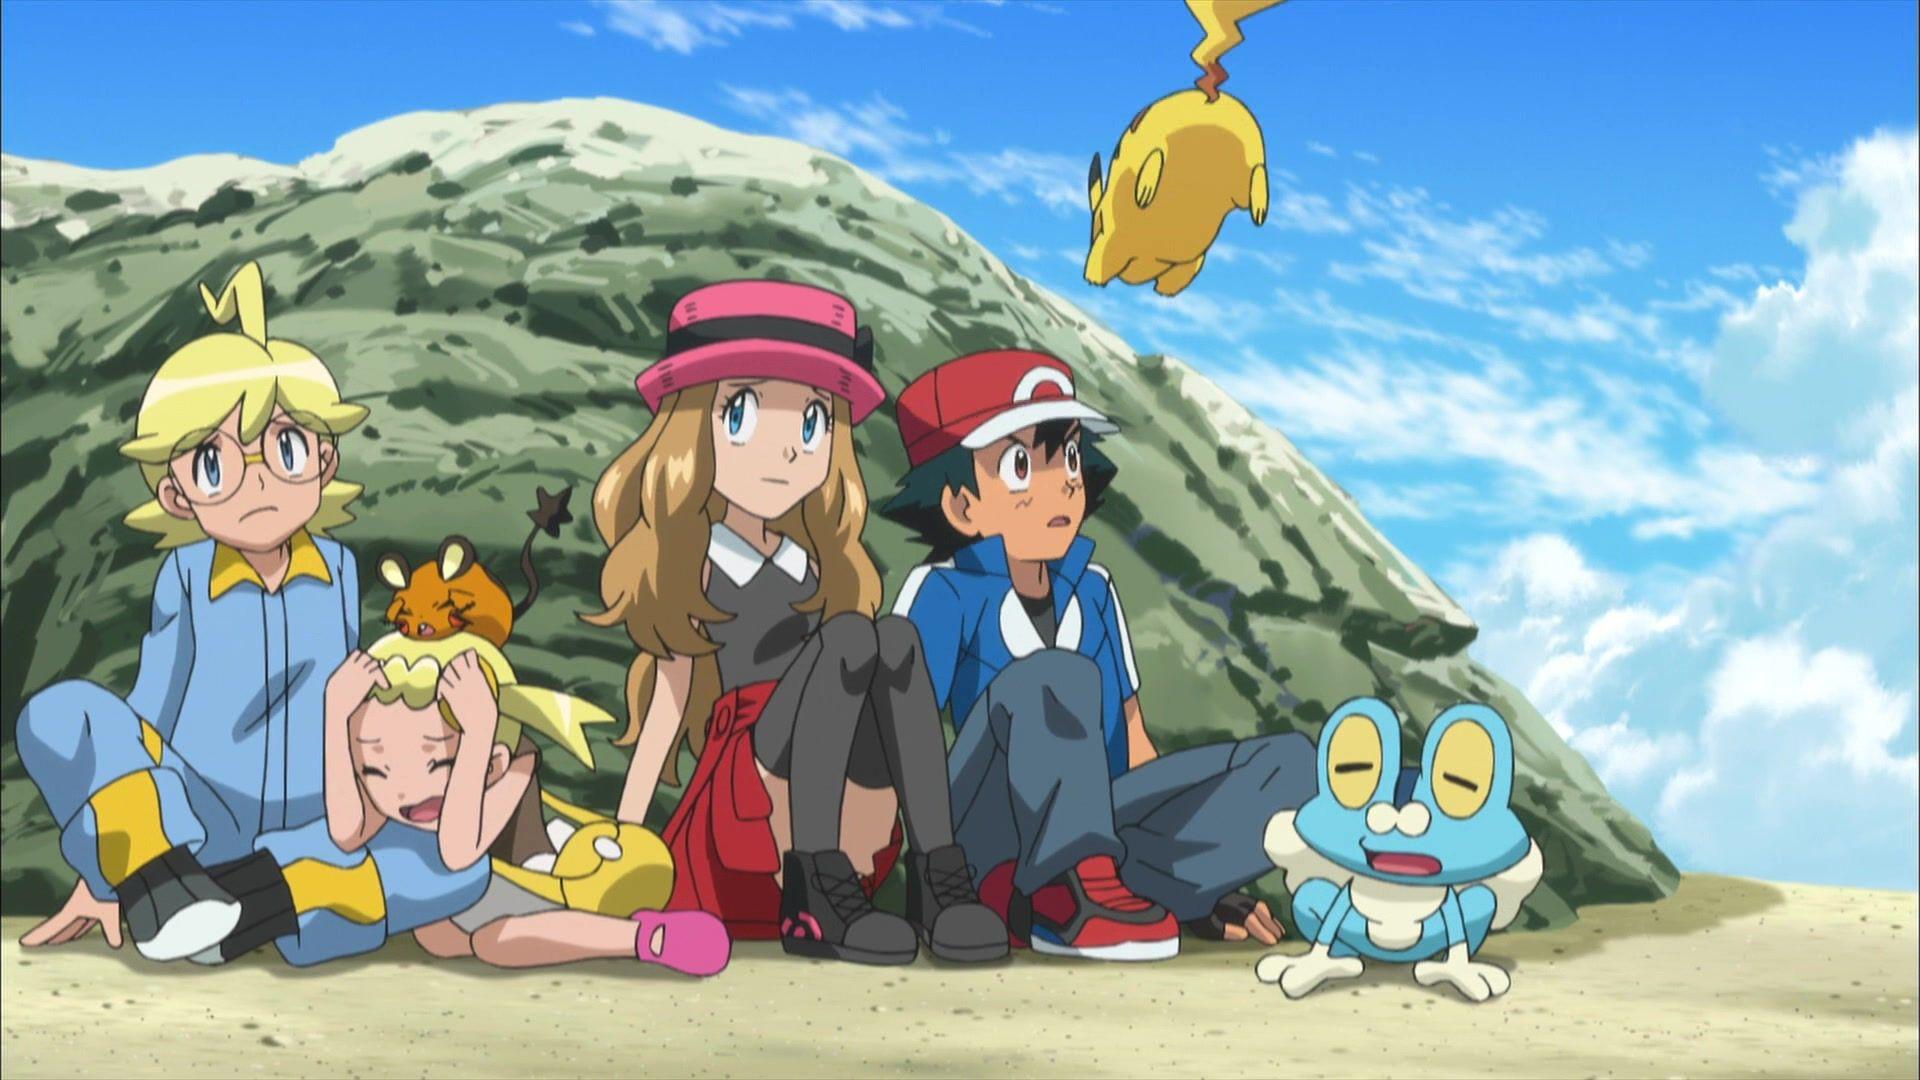 Anime Screencap And Image For Pokemon Xy Fancaps Net Pokemon